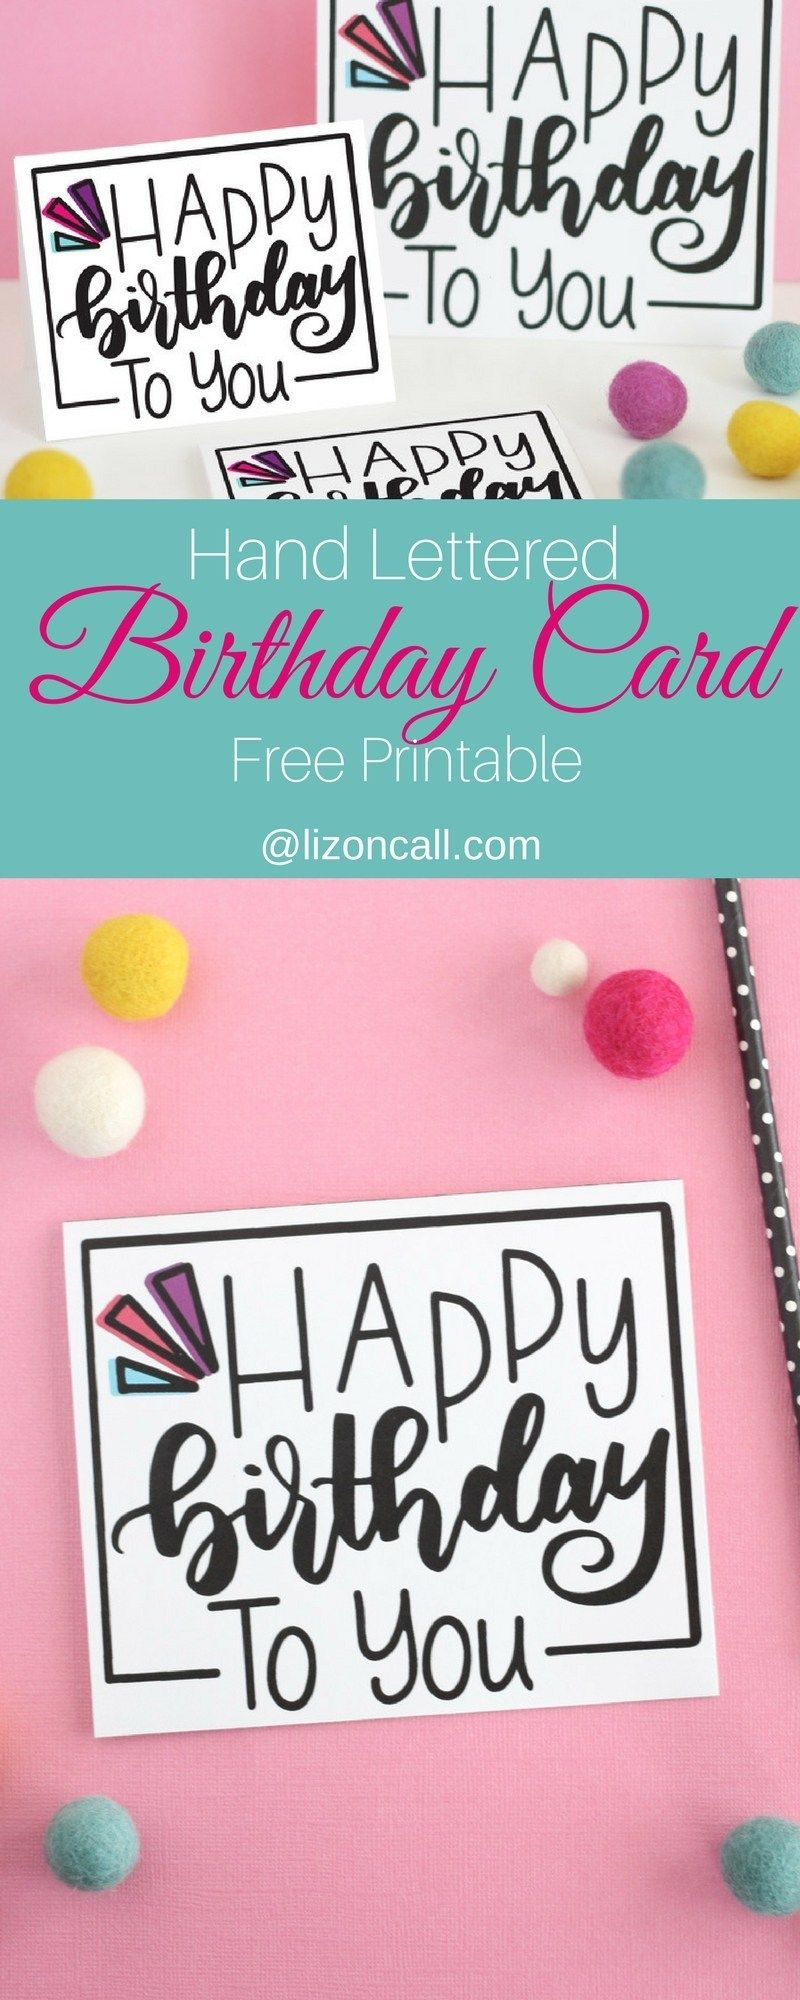 Hand Lettered Free Printable Birthday Card Birthday